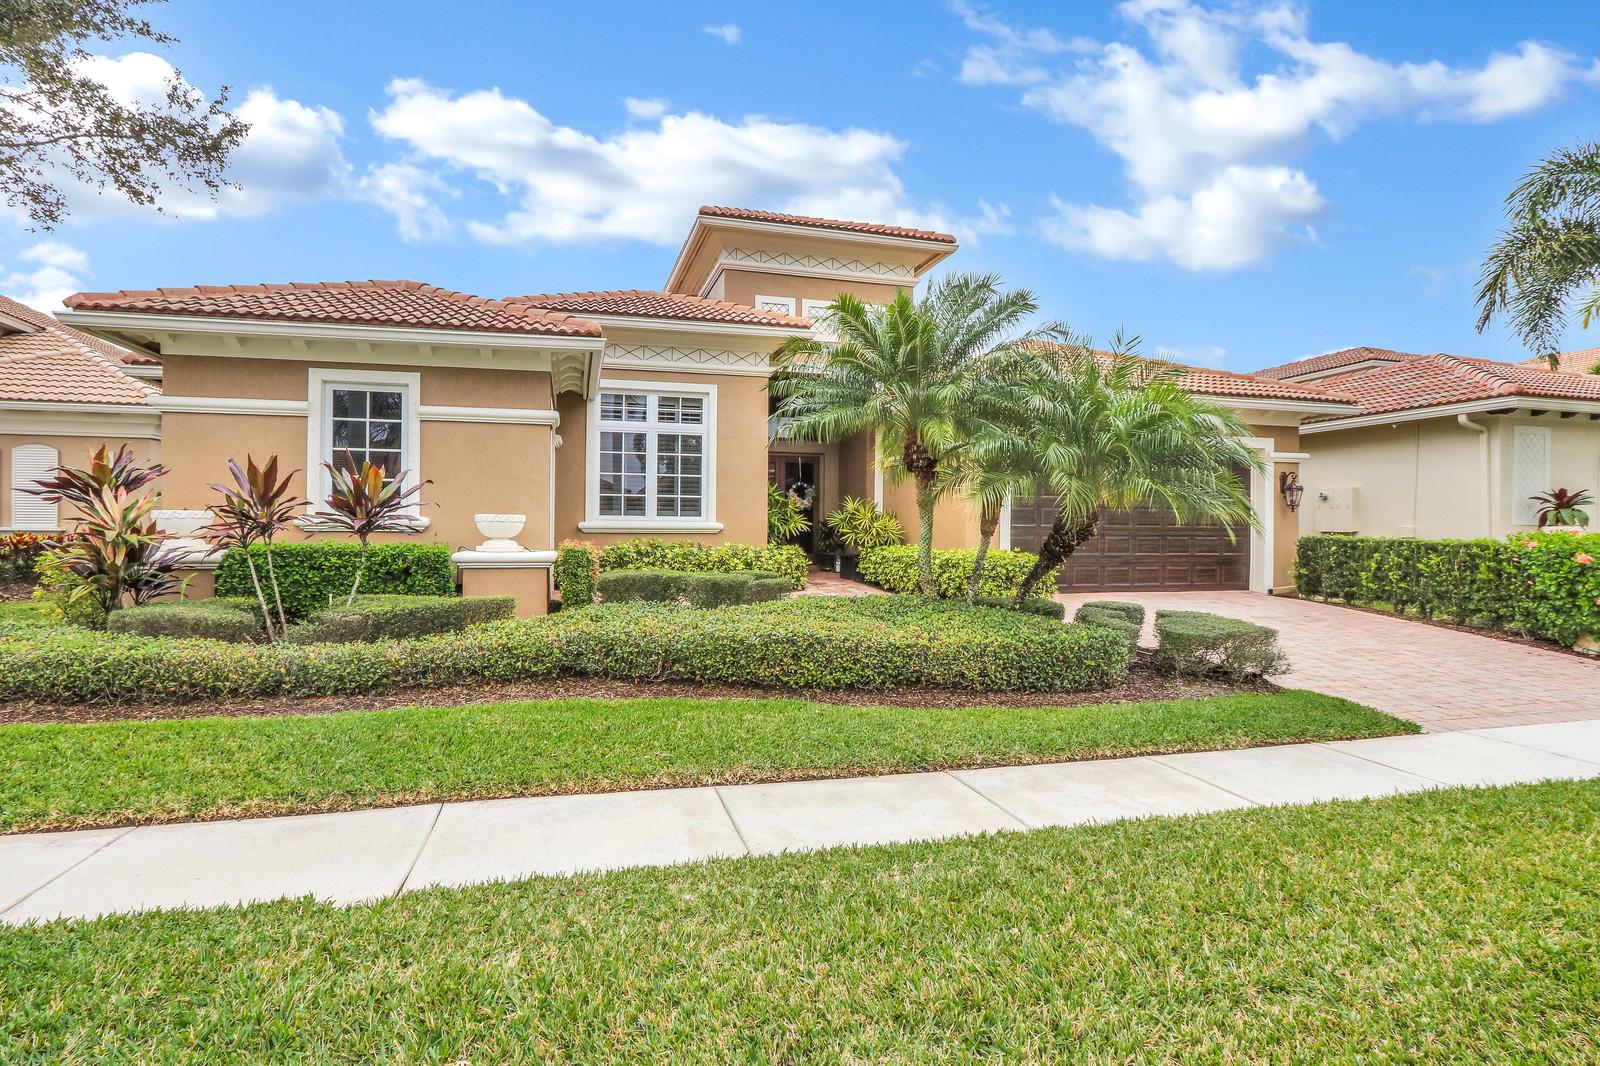 Photo of 7025 Isla Vista Drive, West Palm Beach, FL 33412